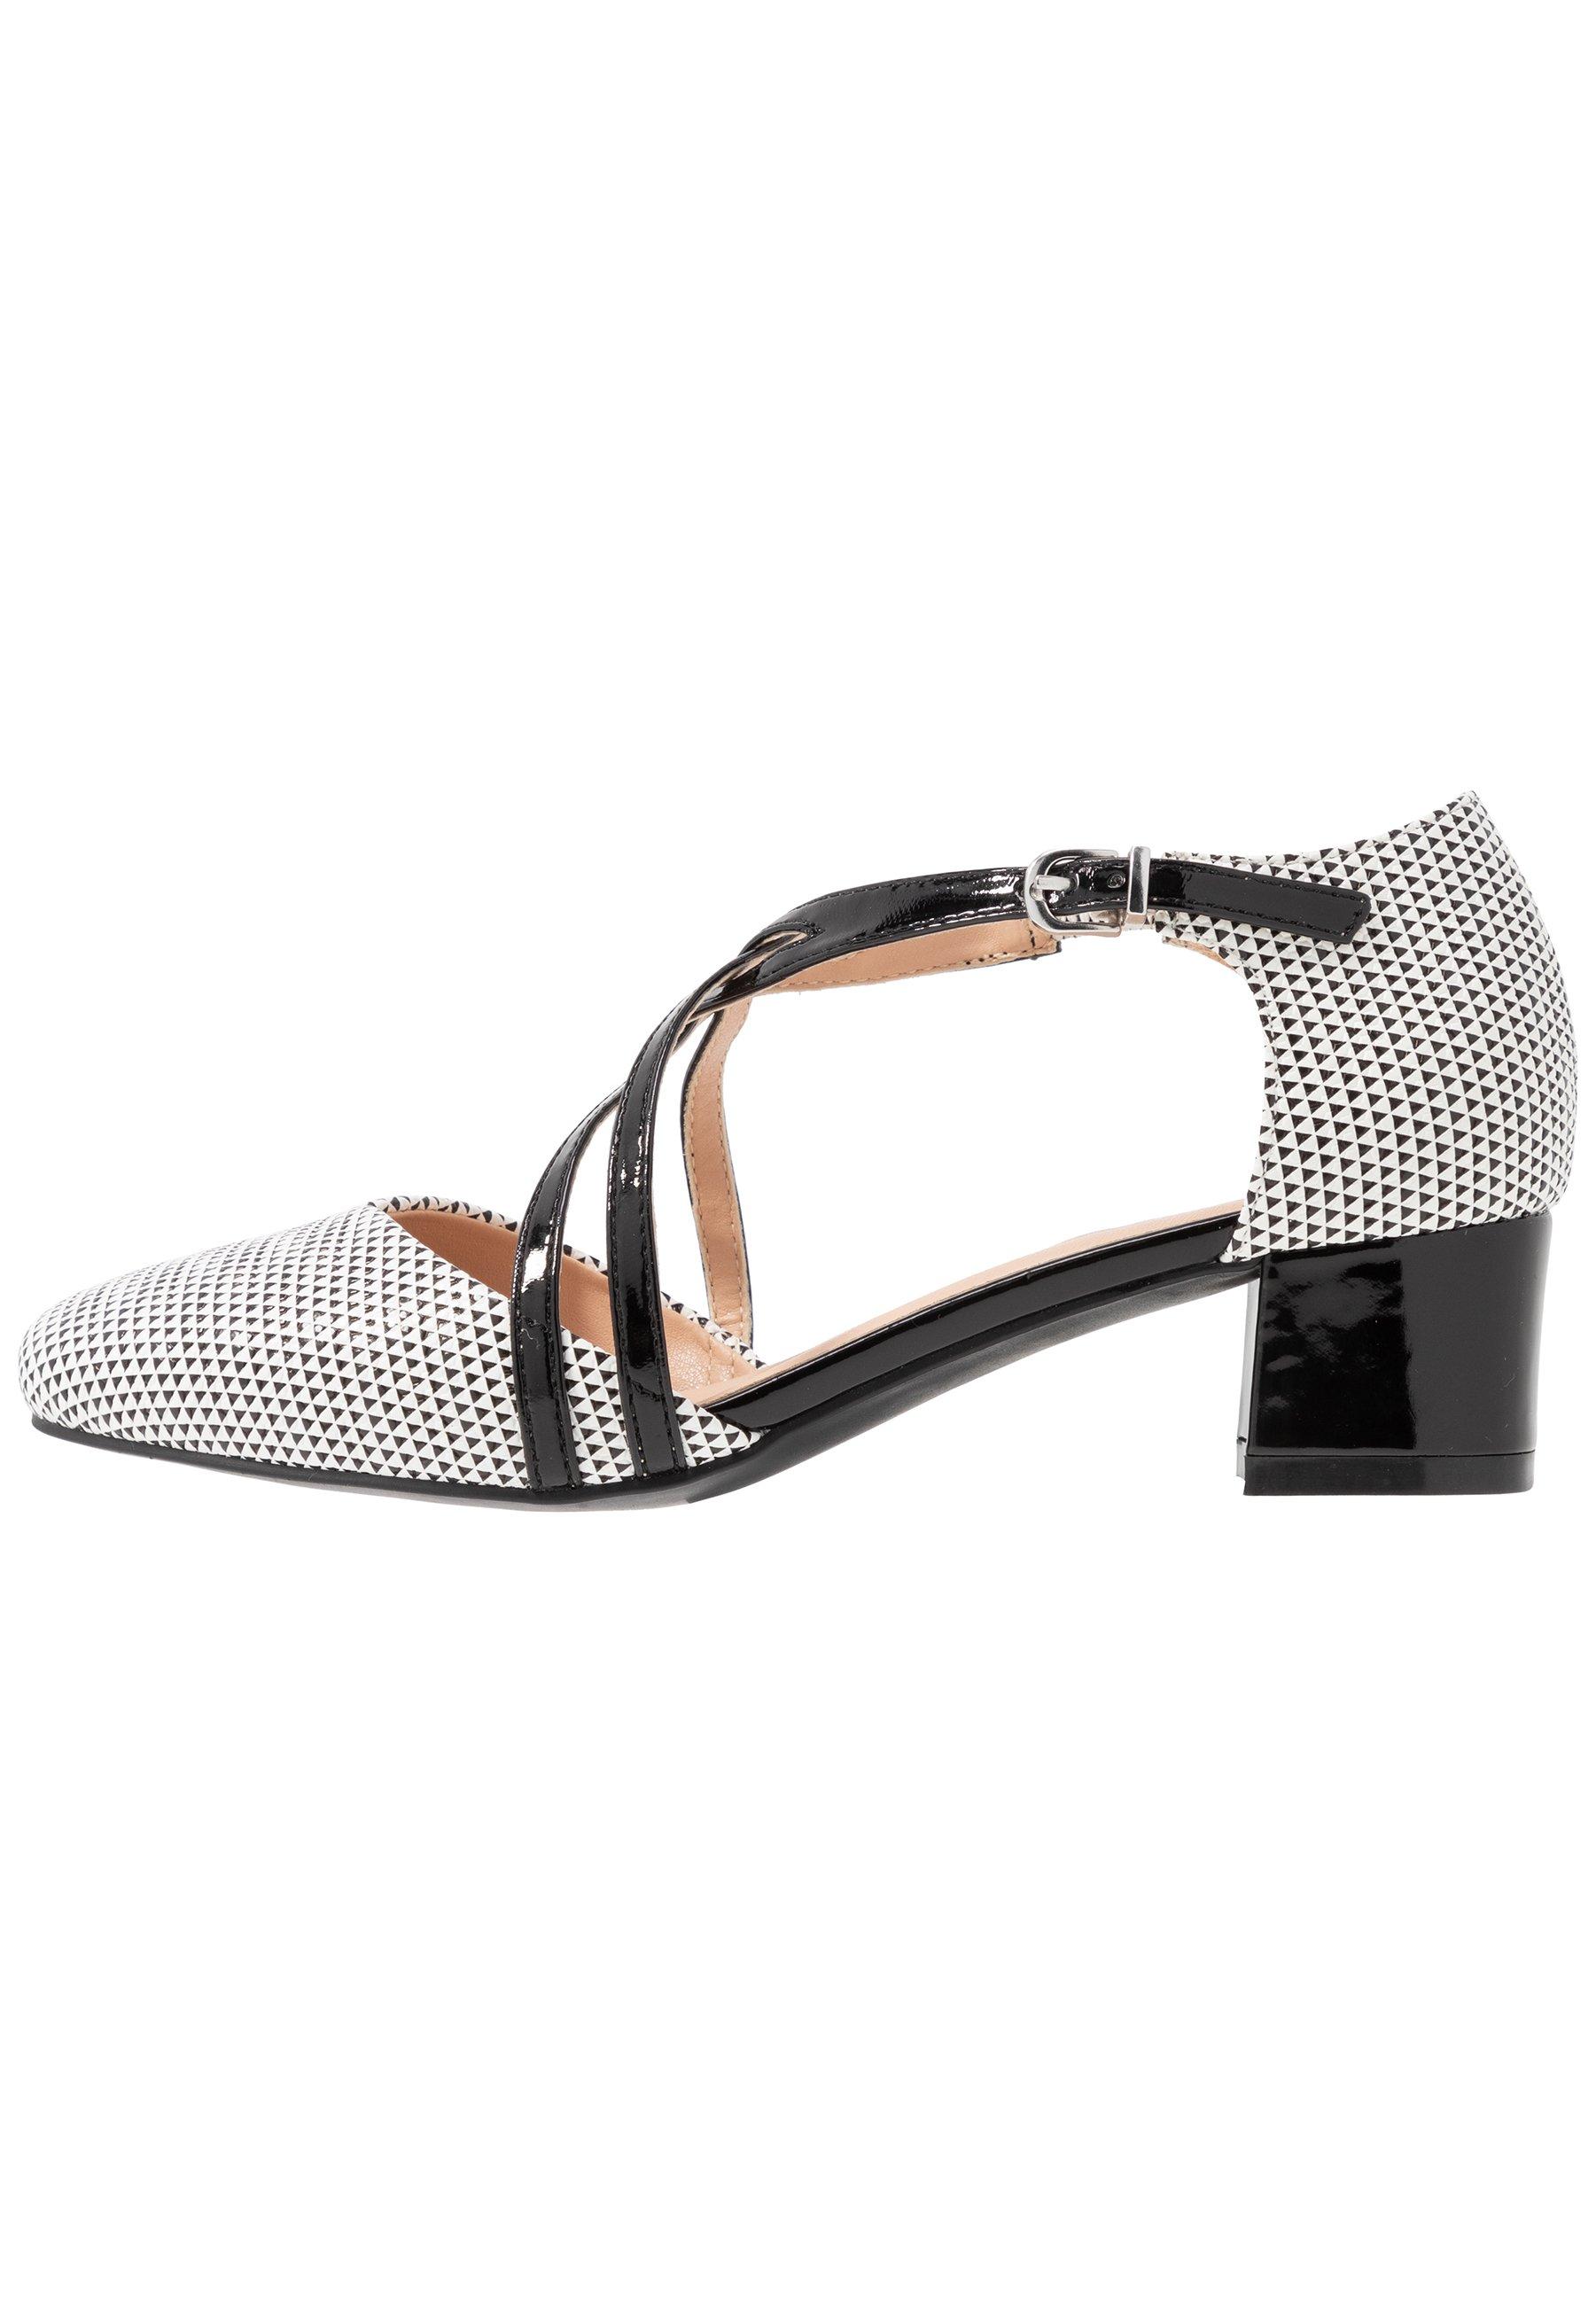 Wallis Corey - Classic Heels Black/white